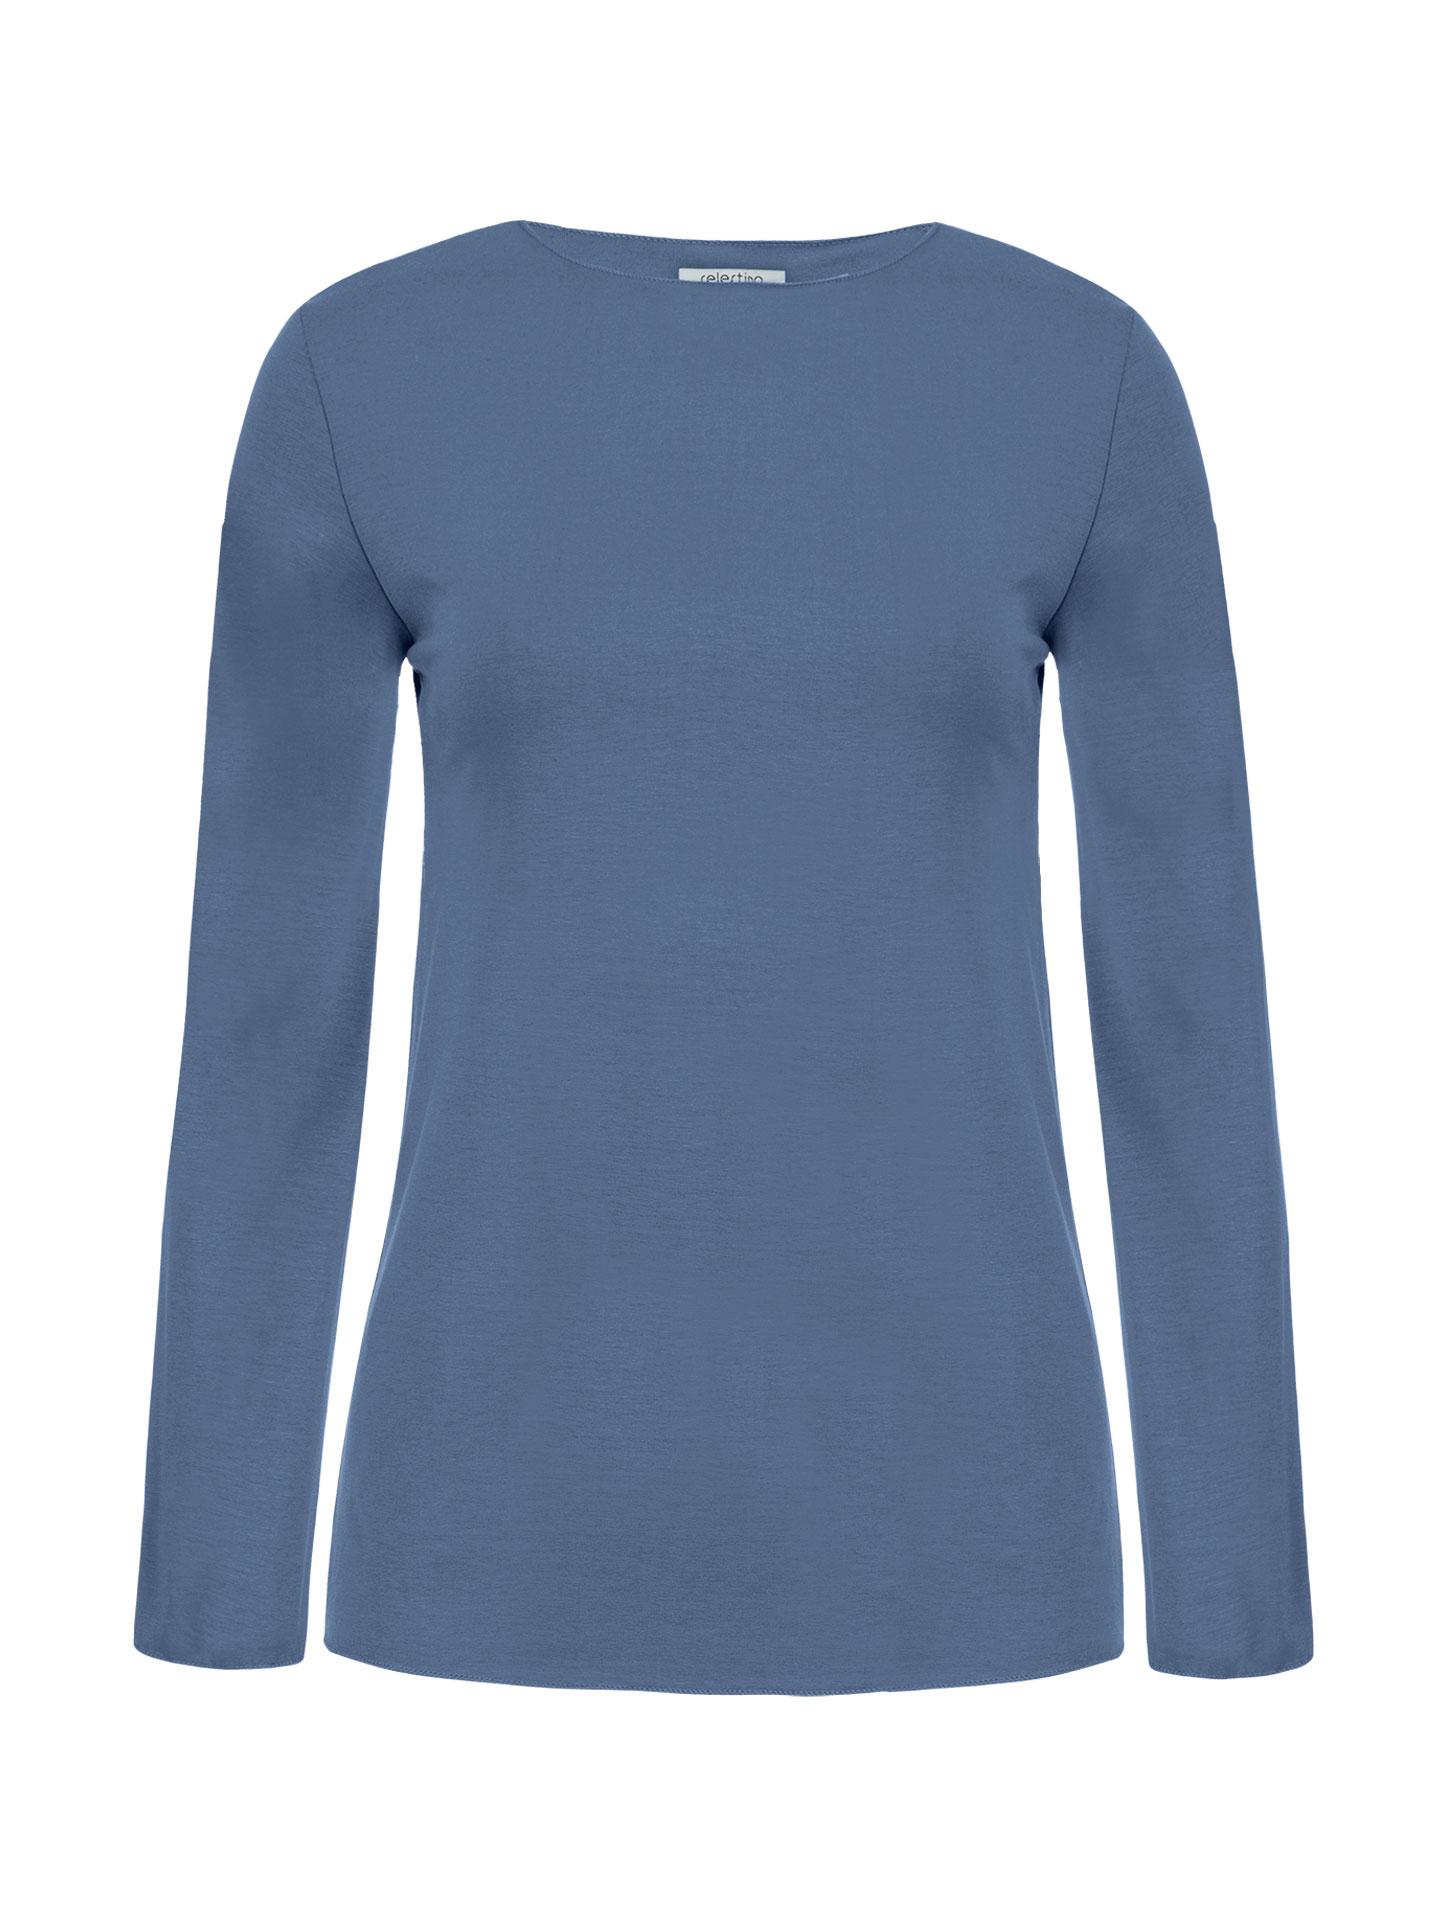 8df9b74b6e35 Μακρυμάνικη μπλούζα σε μπλε ραφ